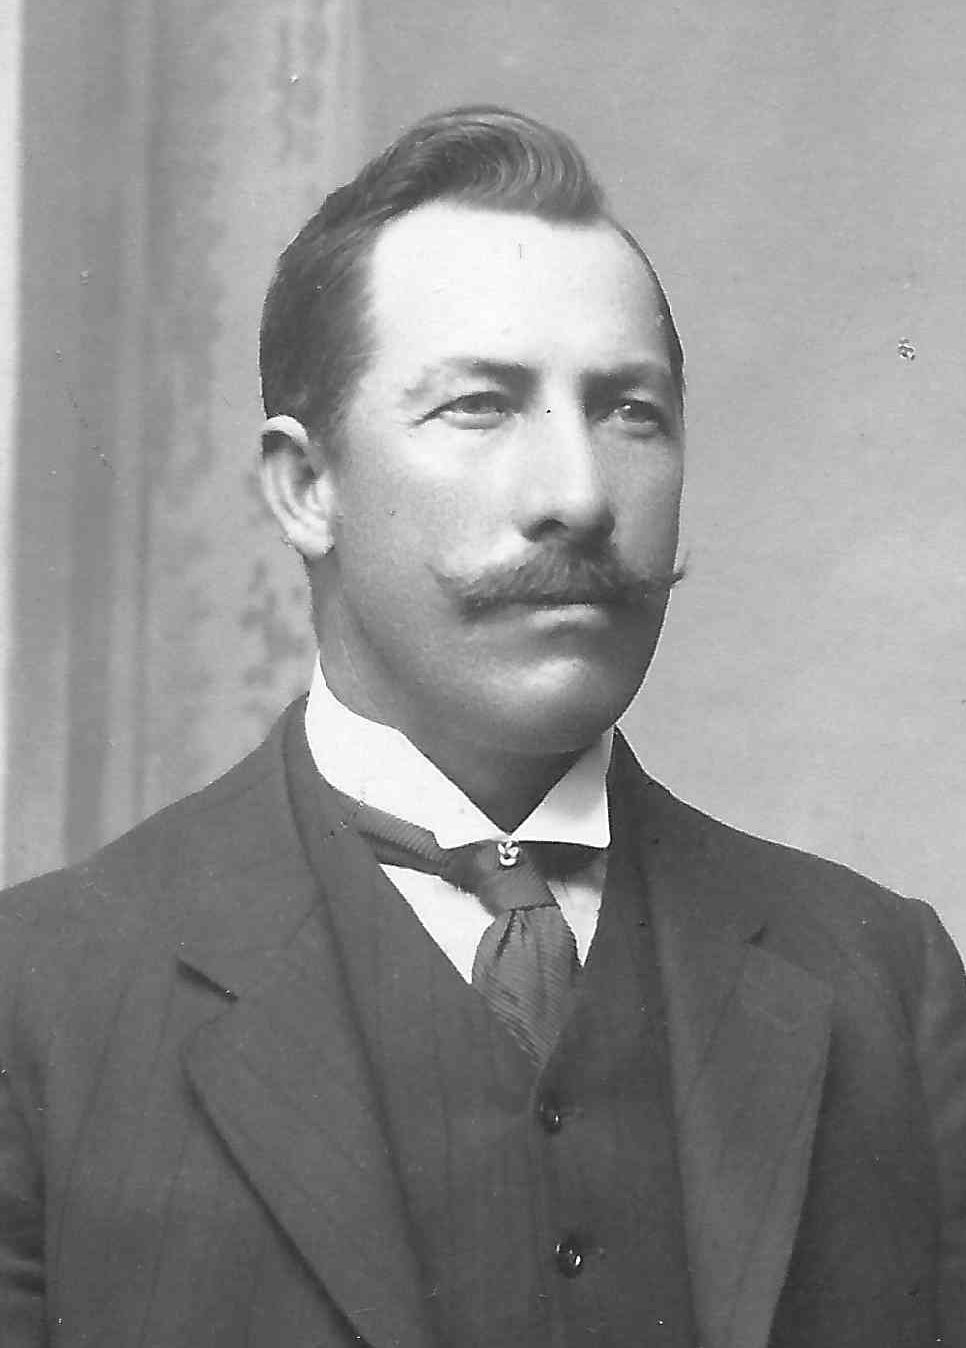 Breinholt, Louis Martin